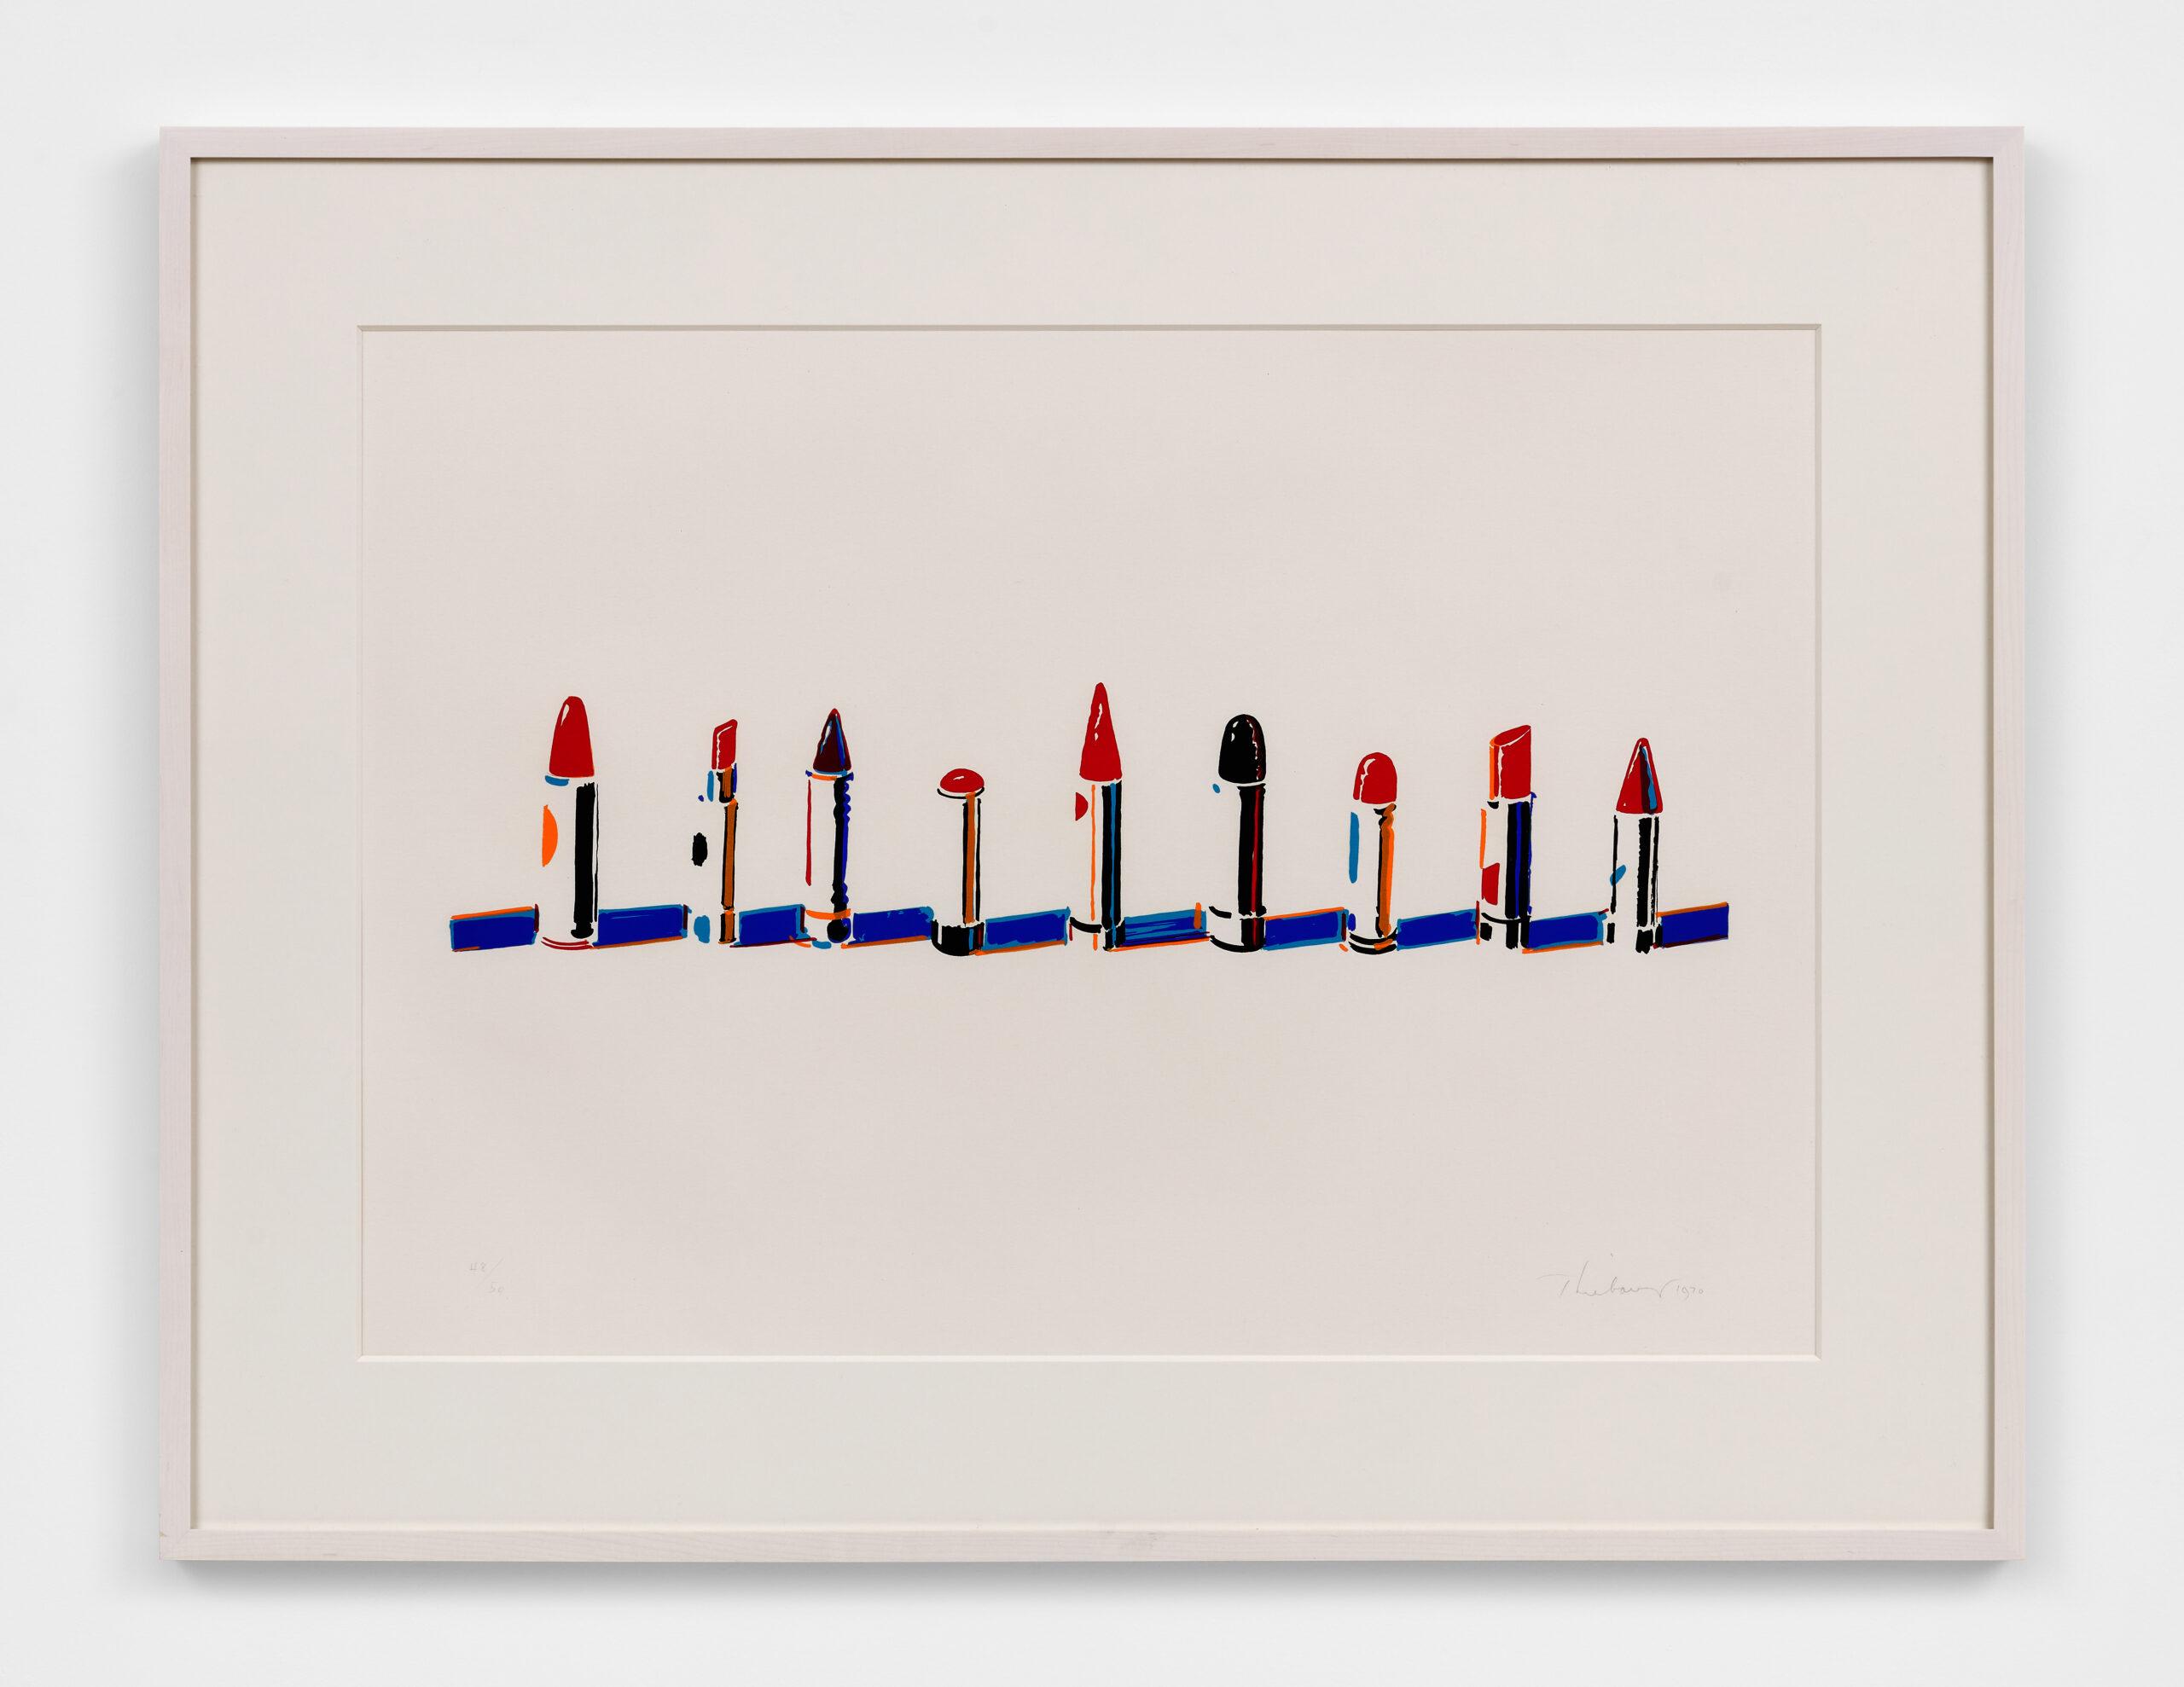 Wayne Thiebaud (American, b. 1920):<br>Lipstick Row